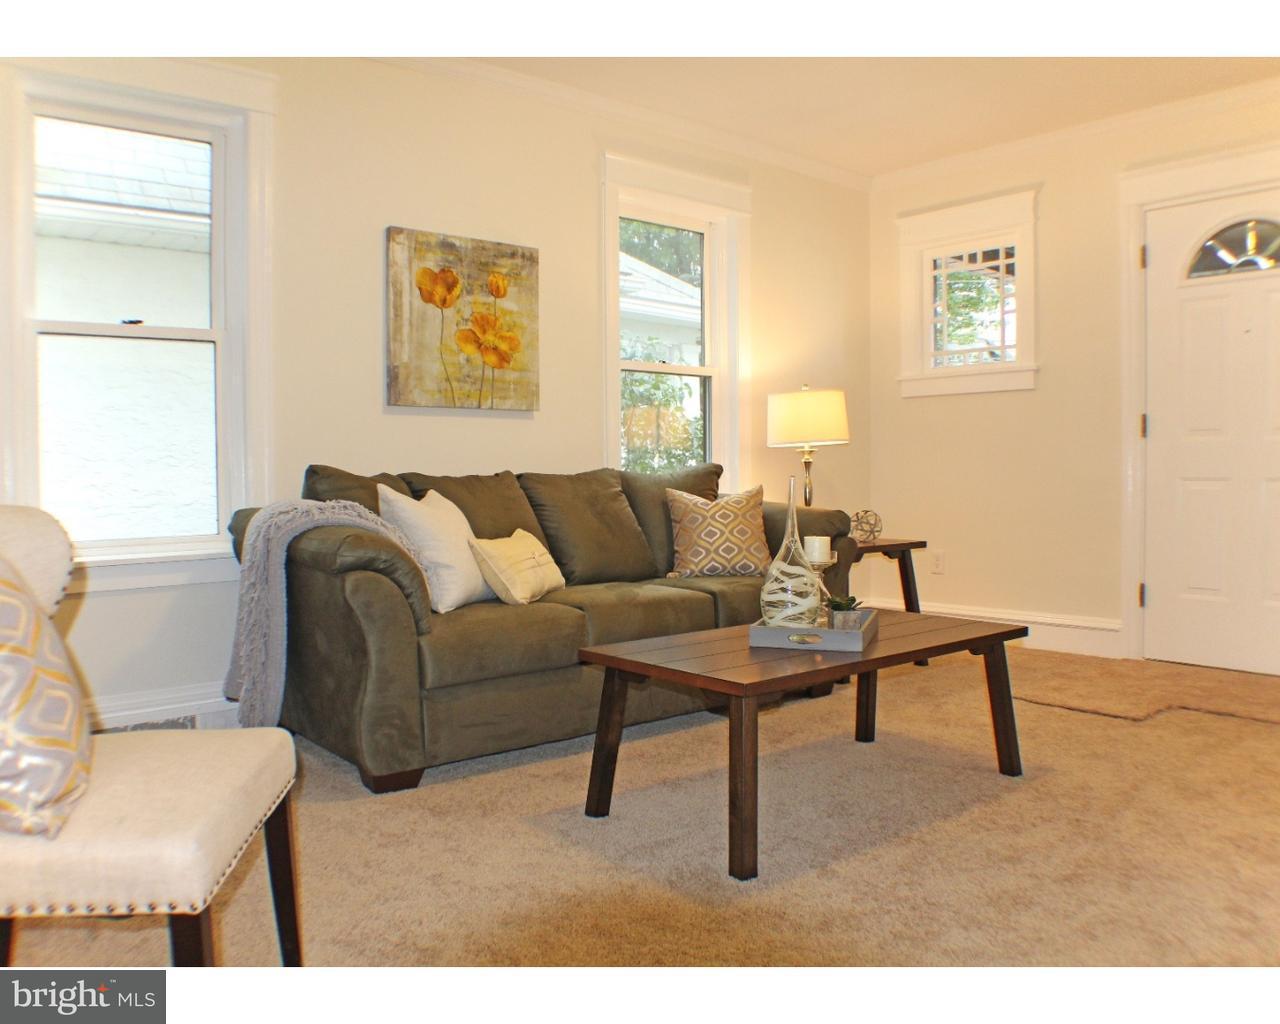 28 W CHELTON RD, PARKSIDE - Listed at $159,000, PARKSIDE